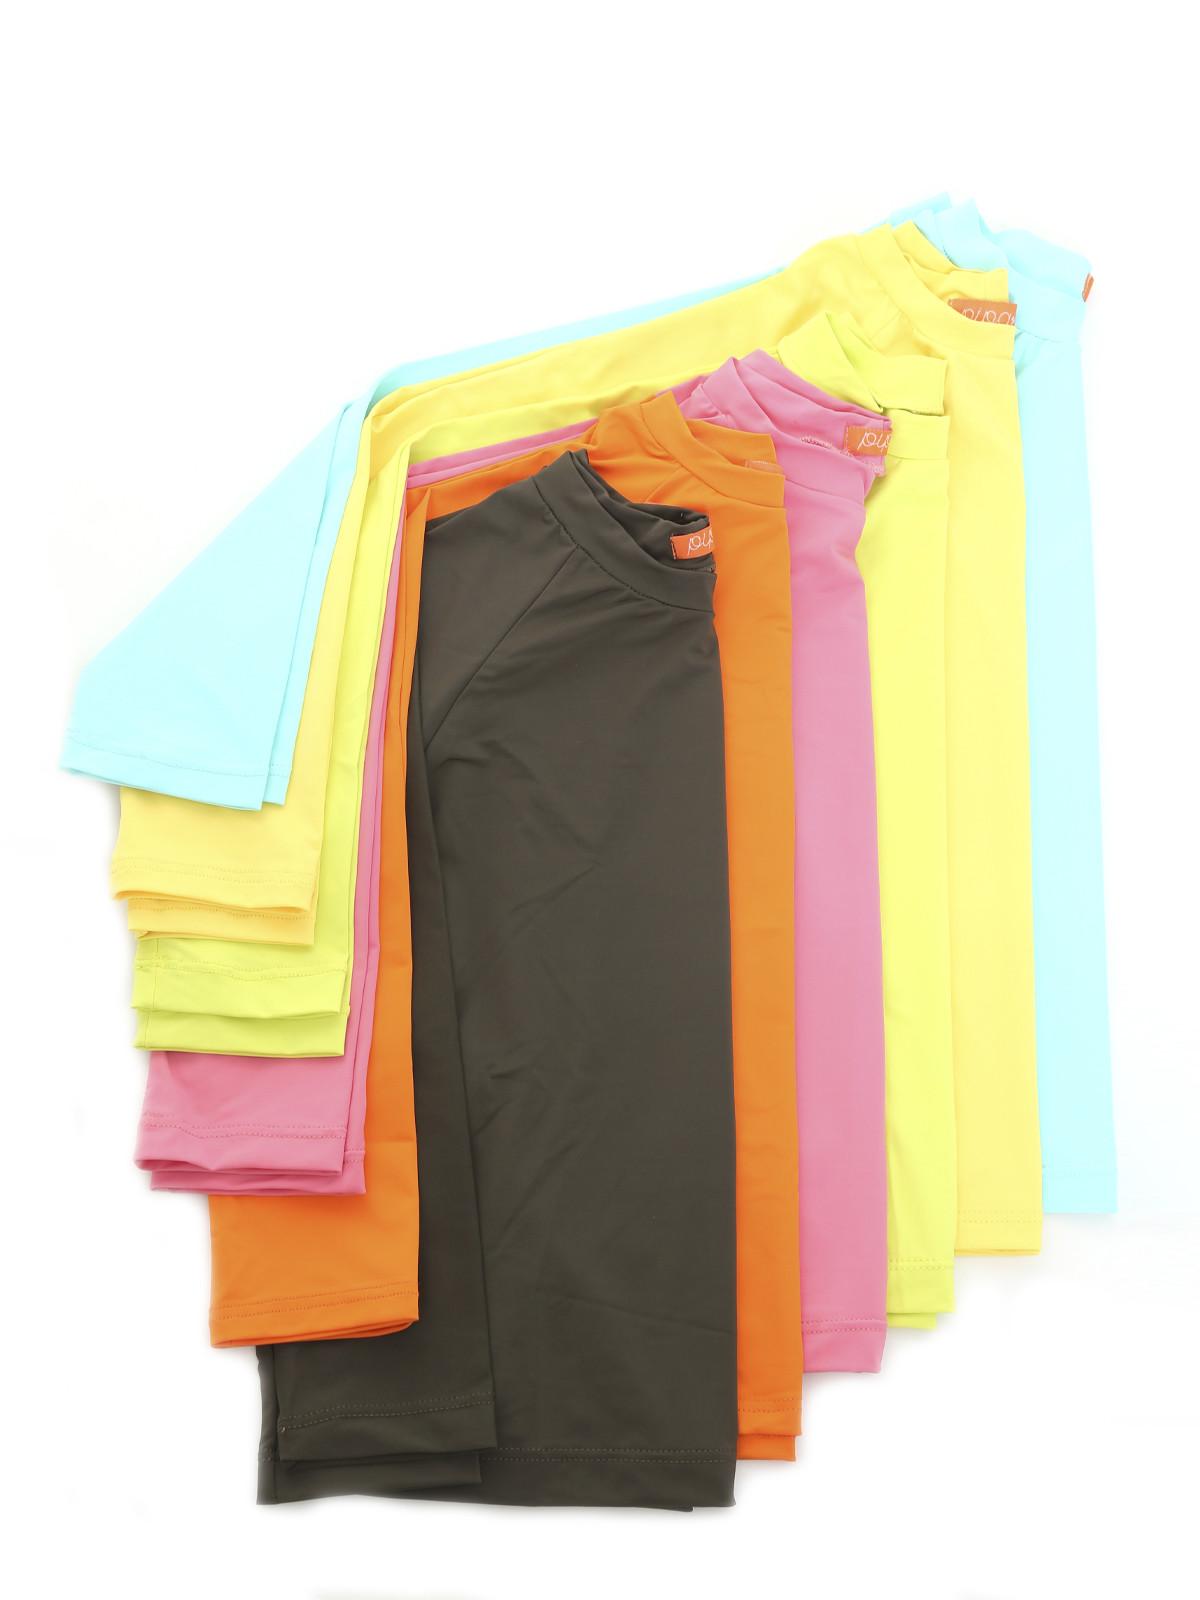 Camiseta UV Manga Longa Laranjada Unisex